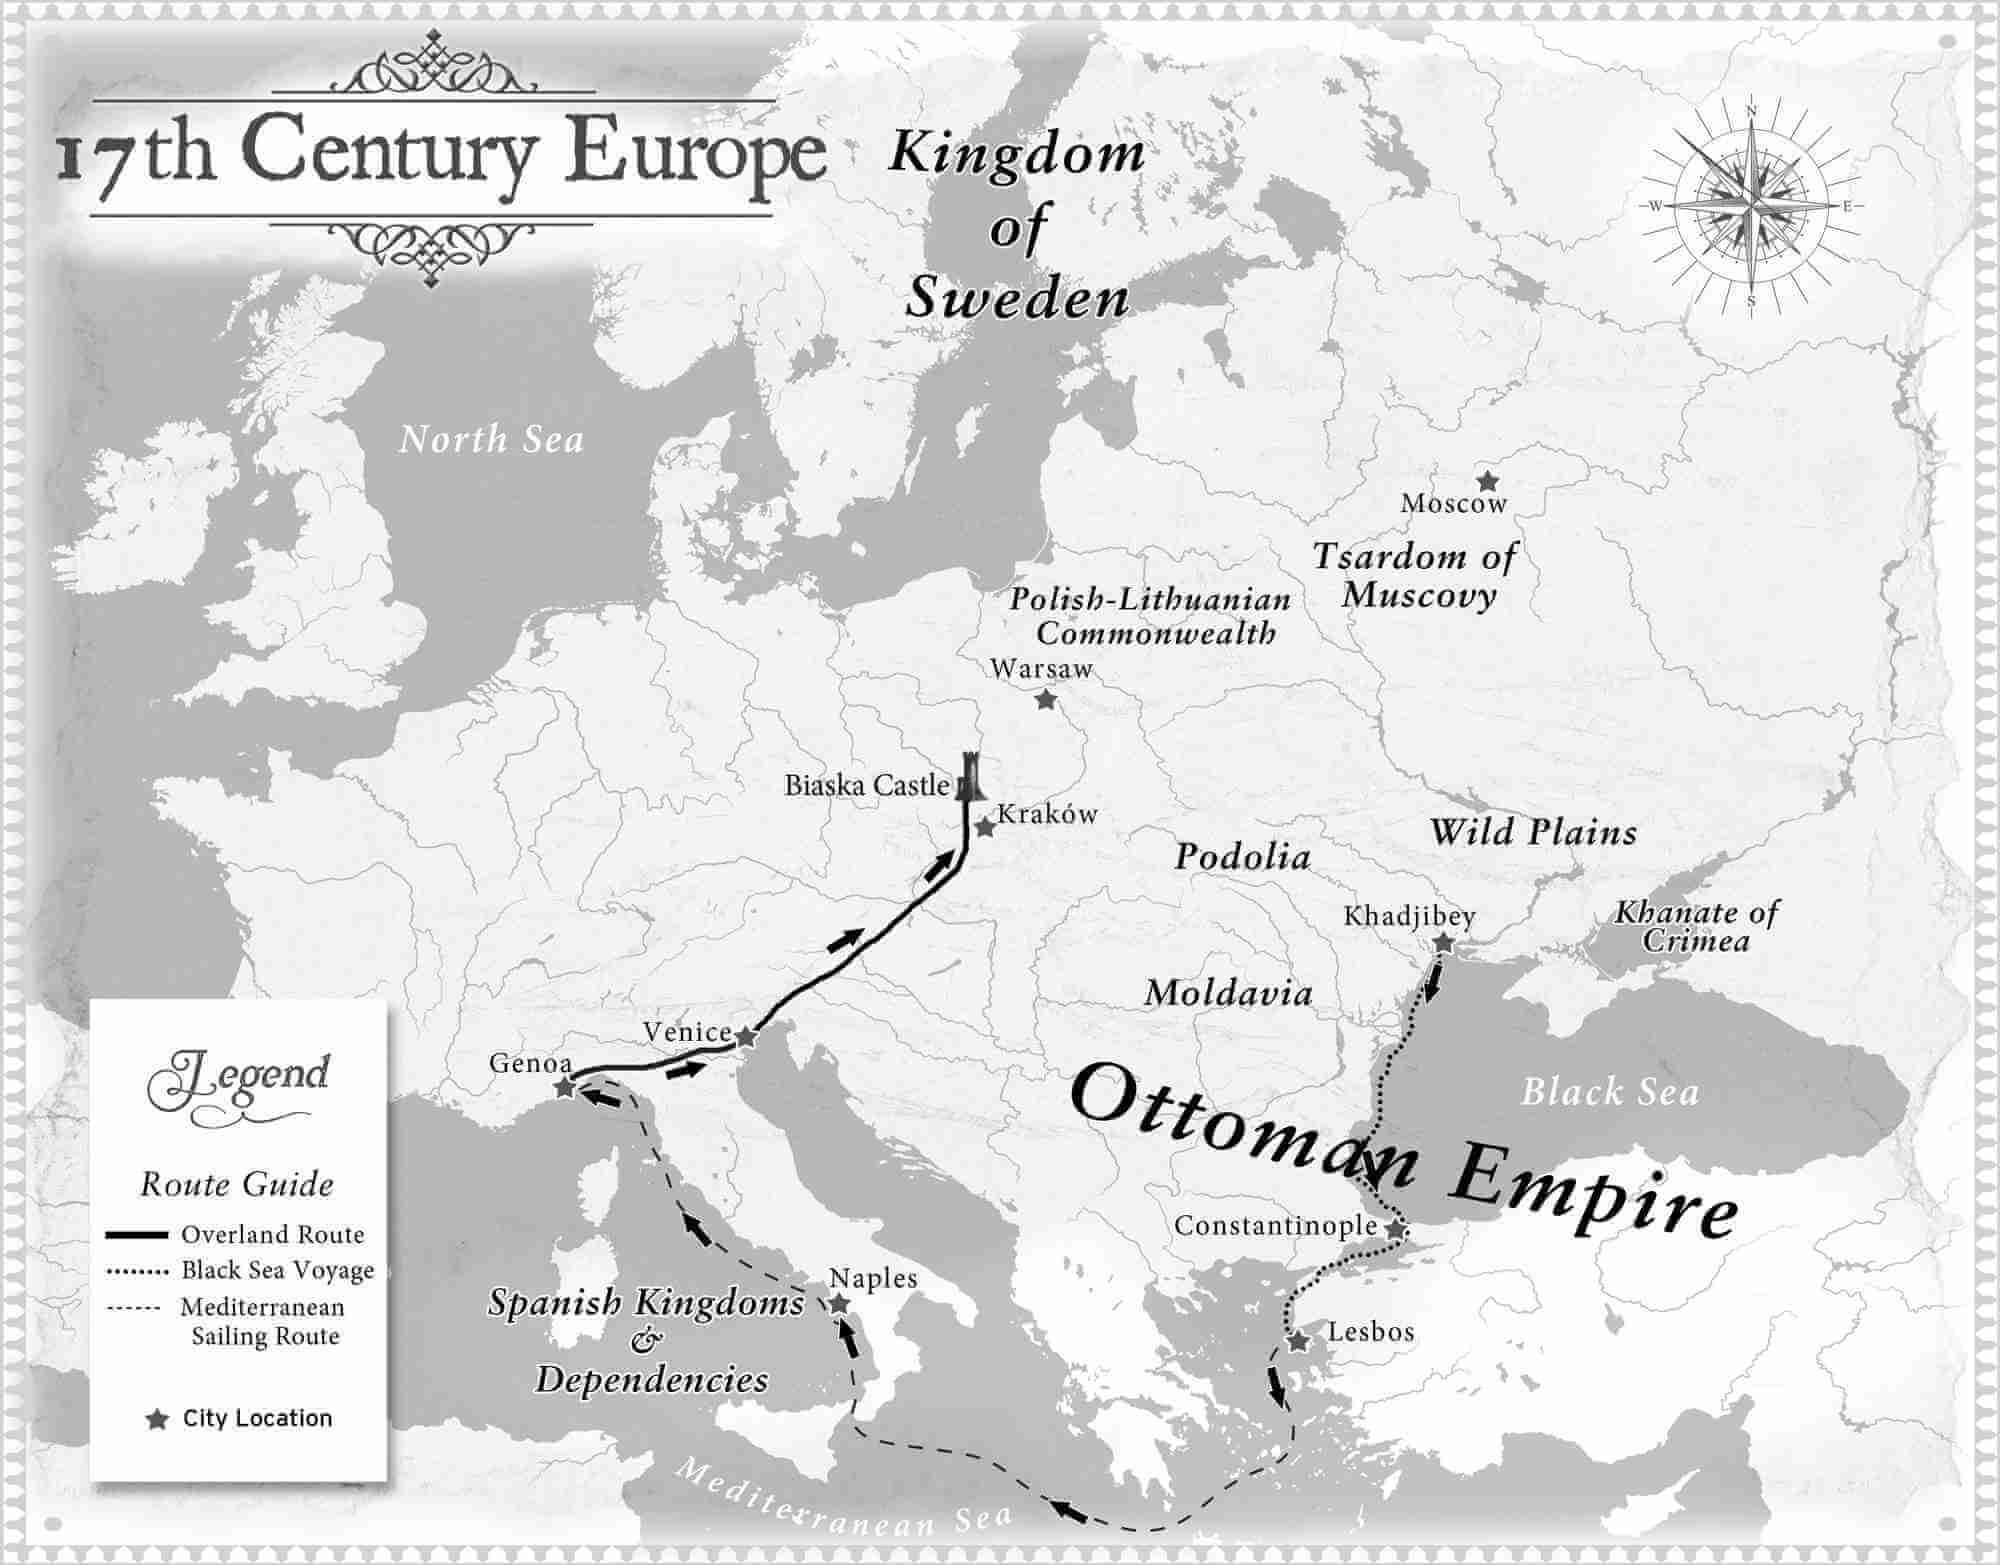 Map of 17th Century Europe